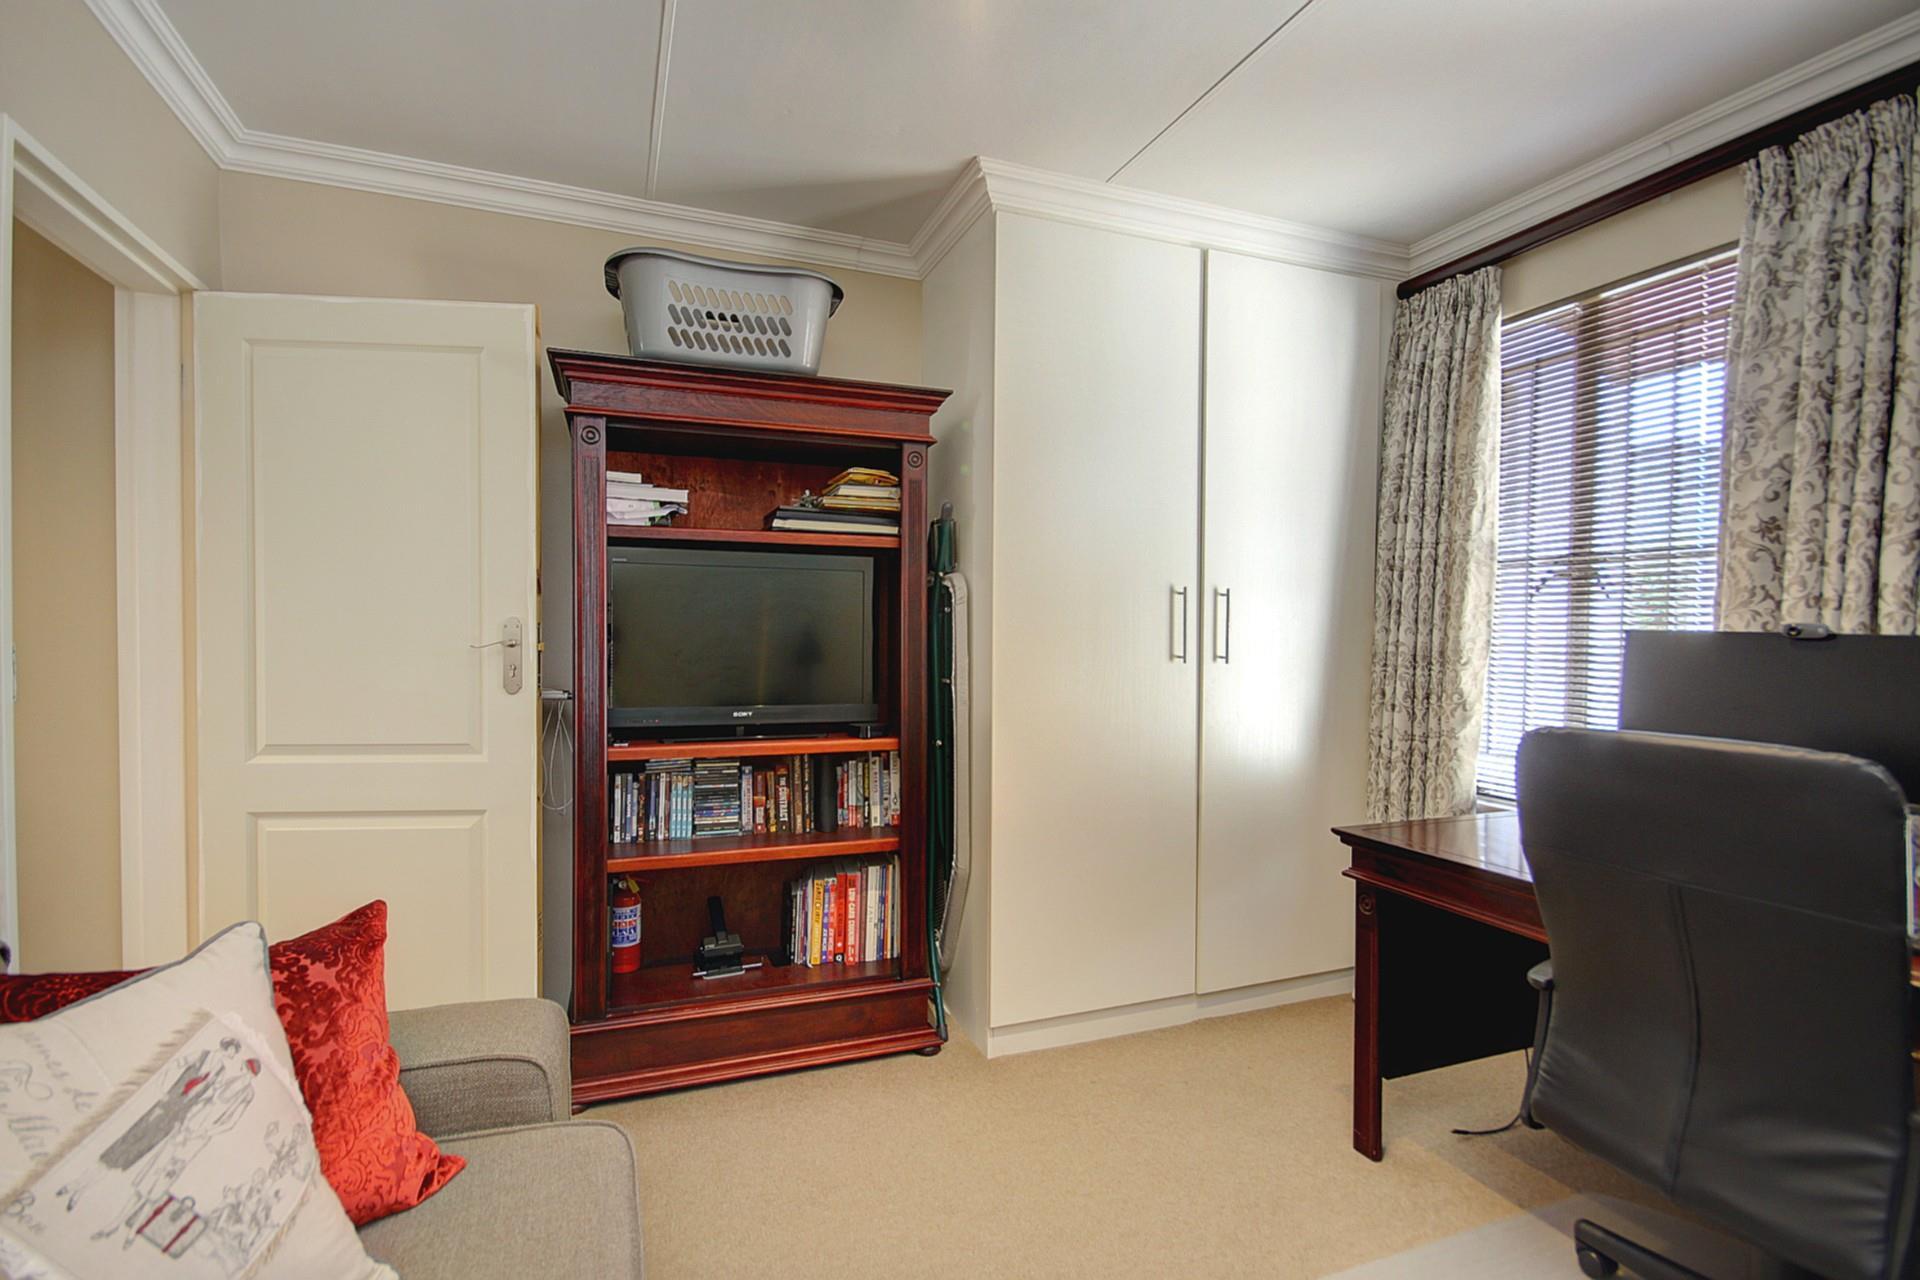 2 Bedroom Apartment / Flat For Sale in President Ridge